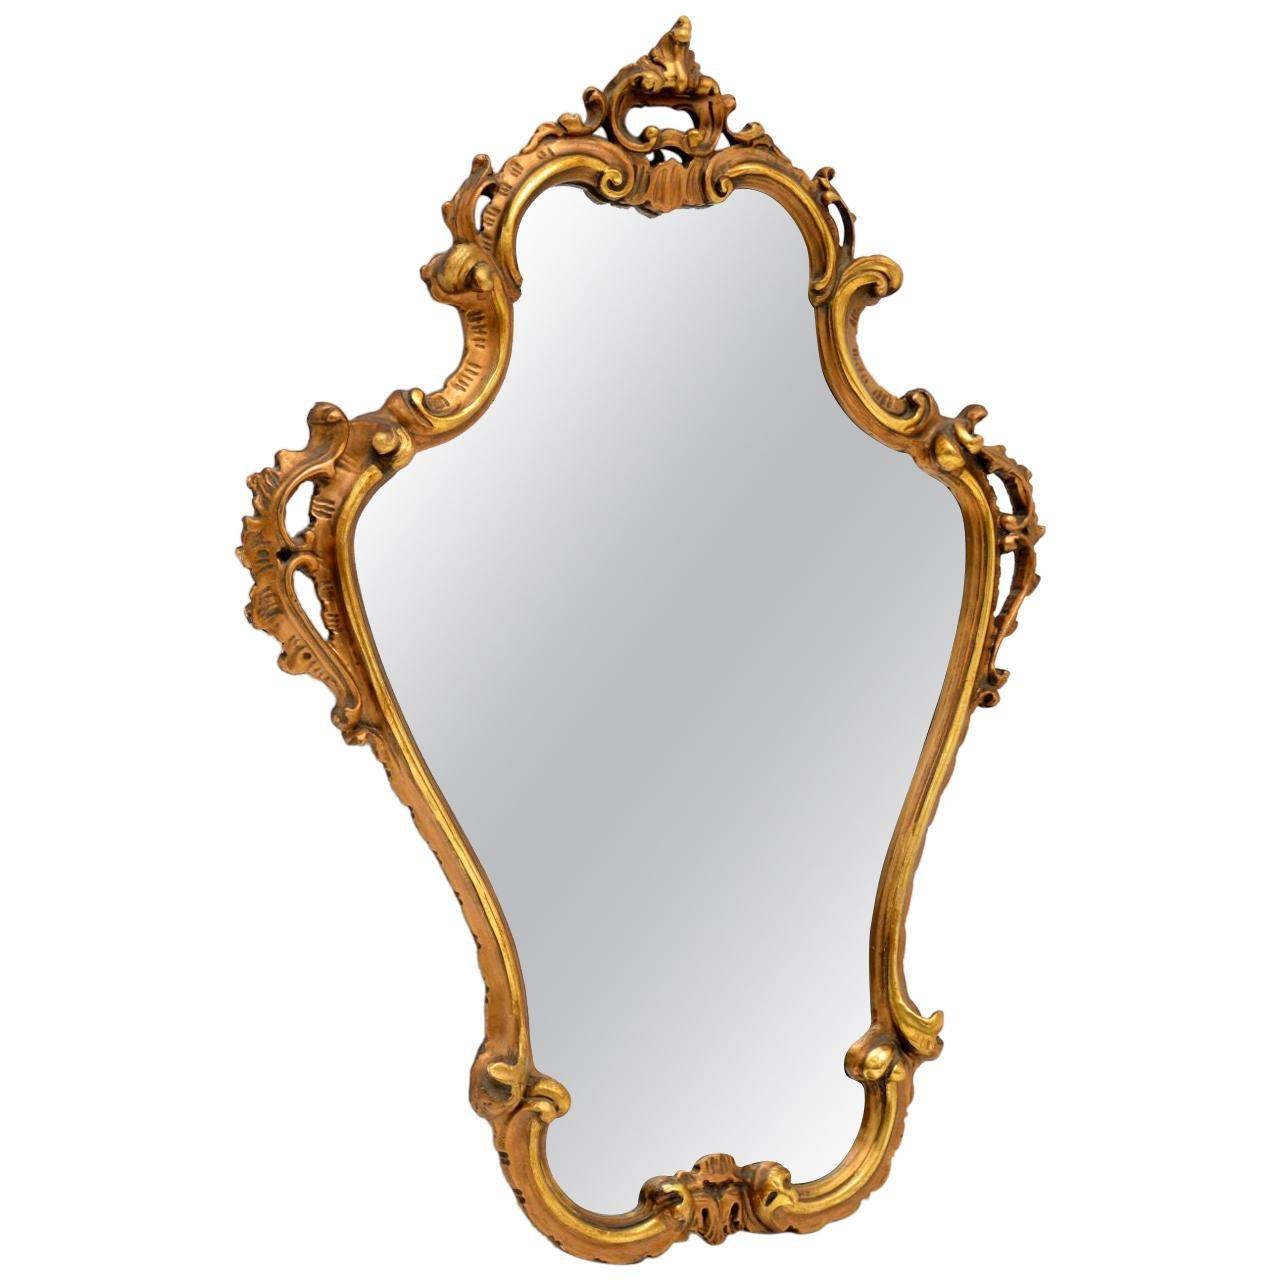 Antique Italian Style Gilt Wood Mirror